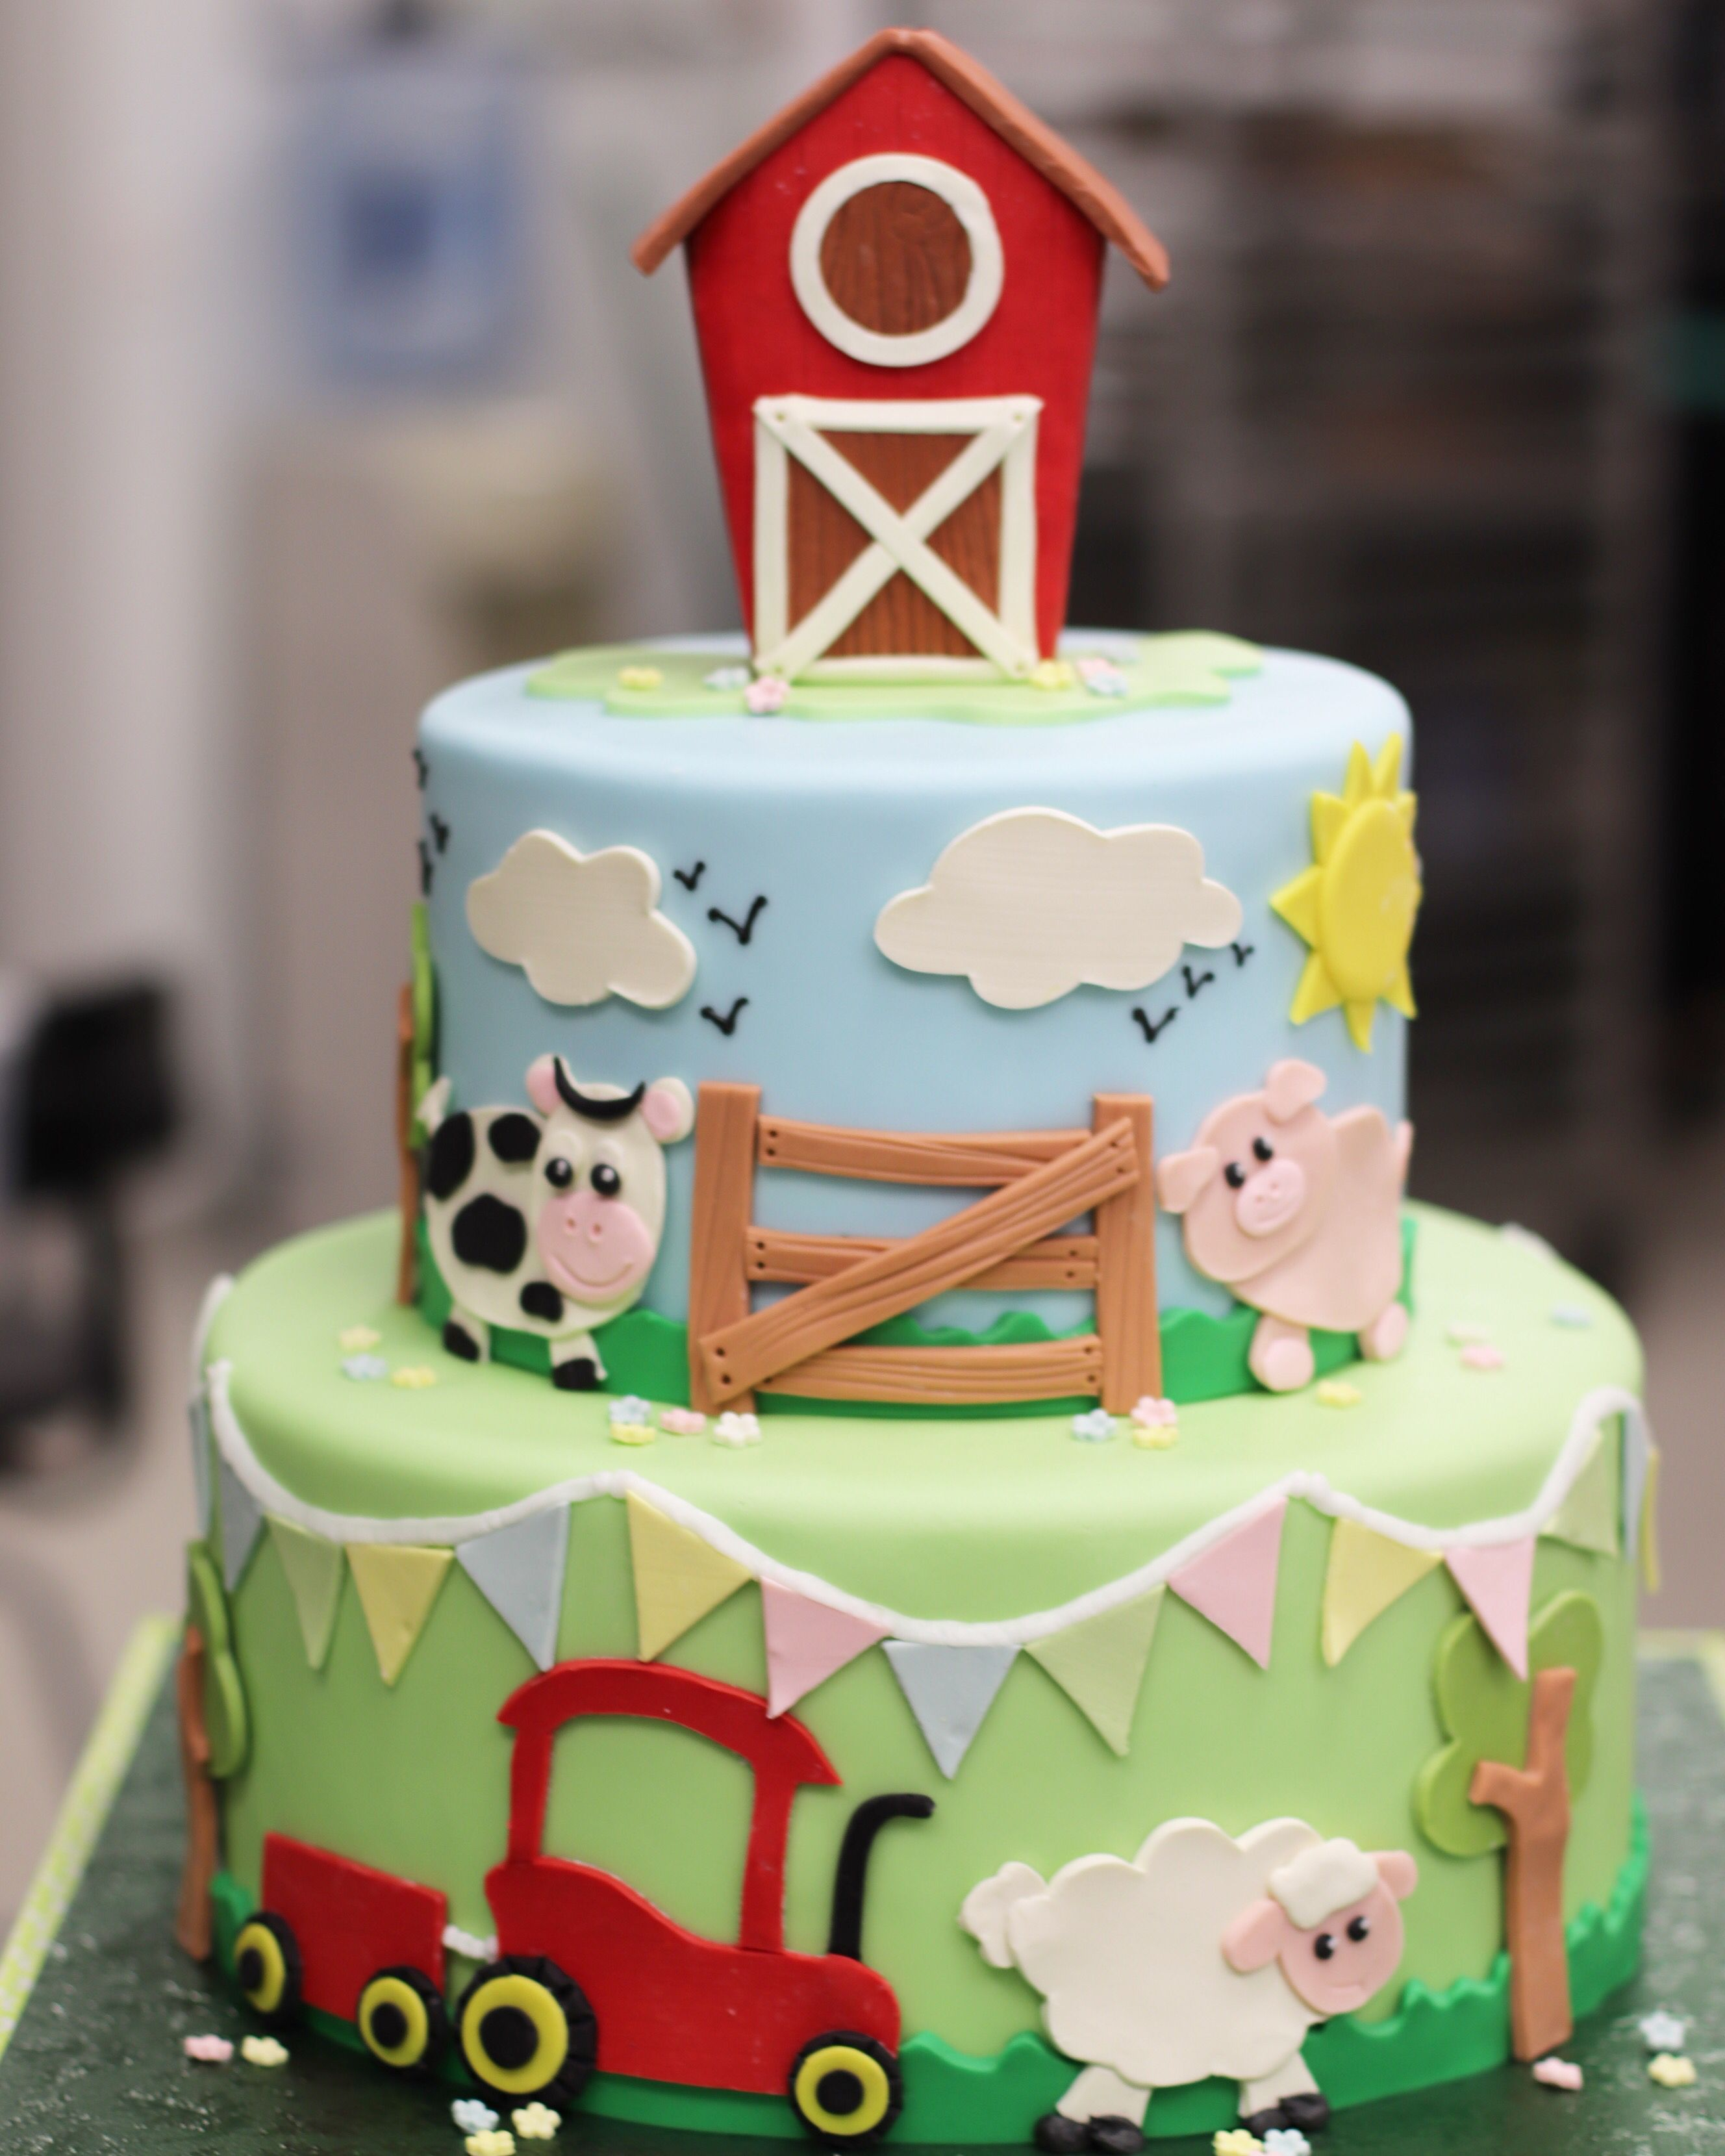 A Little Cake Custom Birthday Cakes Wedding Cakes Nj Nyc